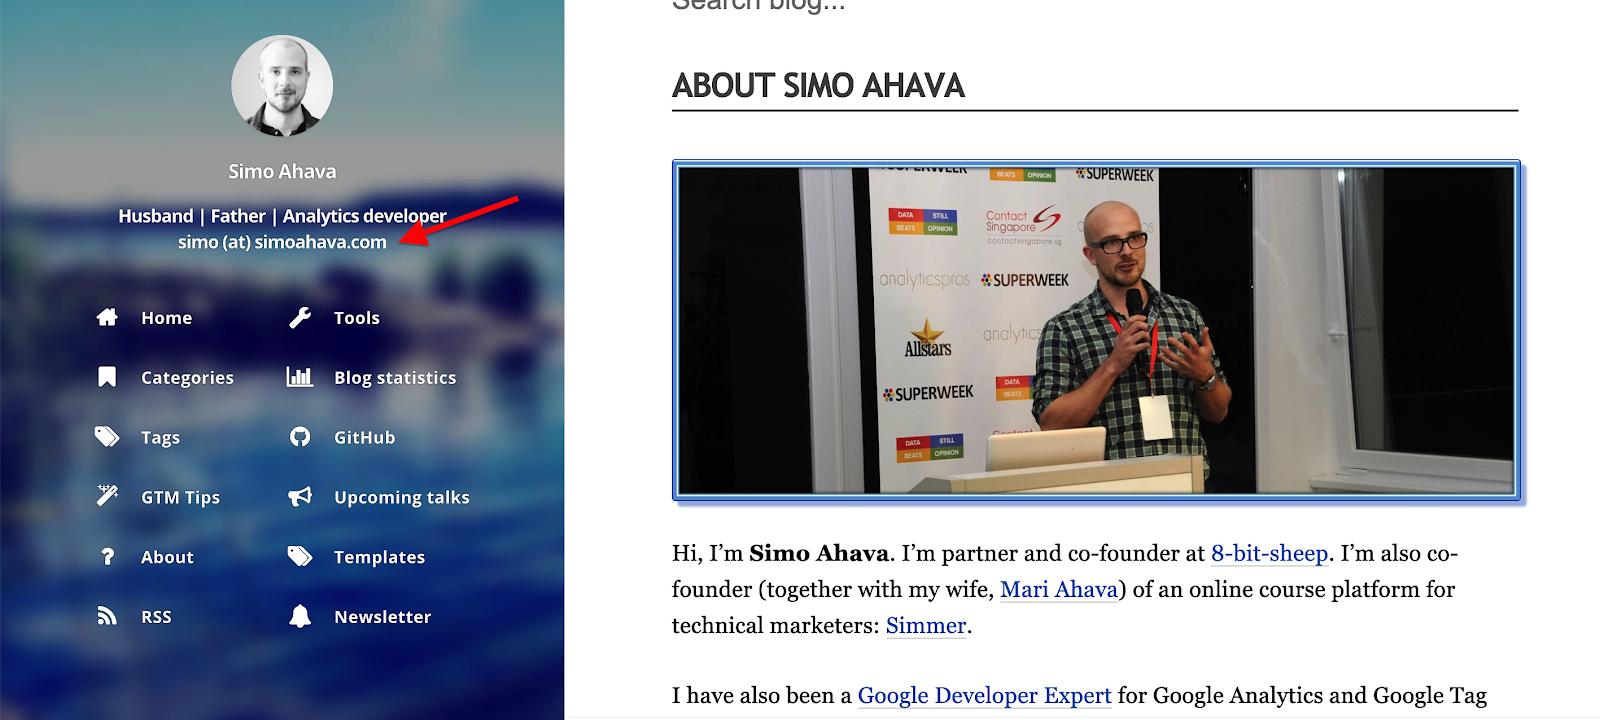 Simo Ahava contact information